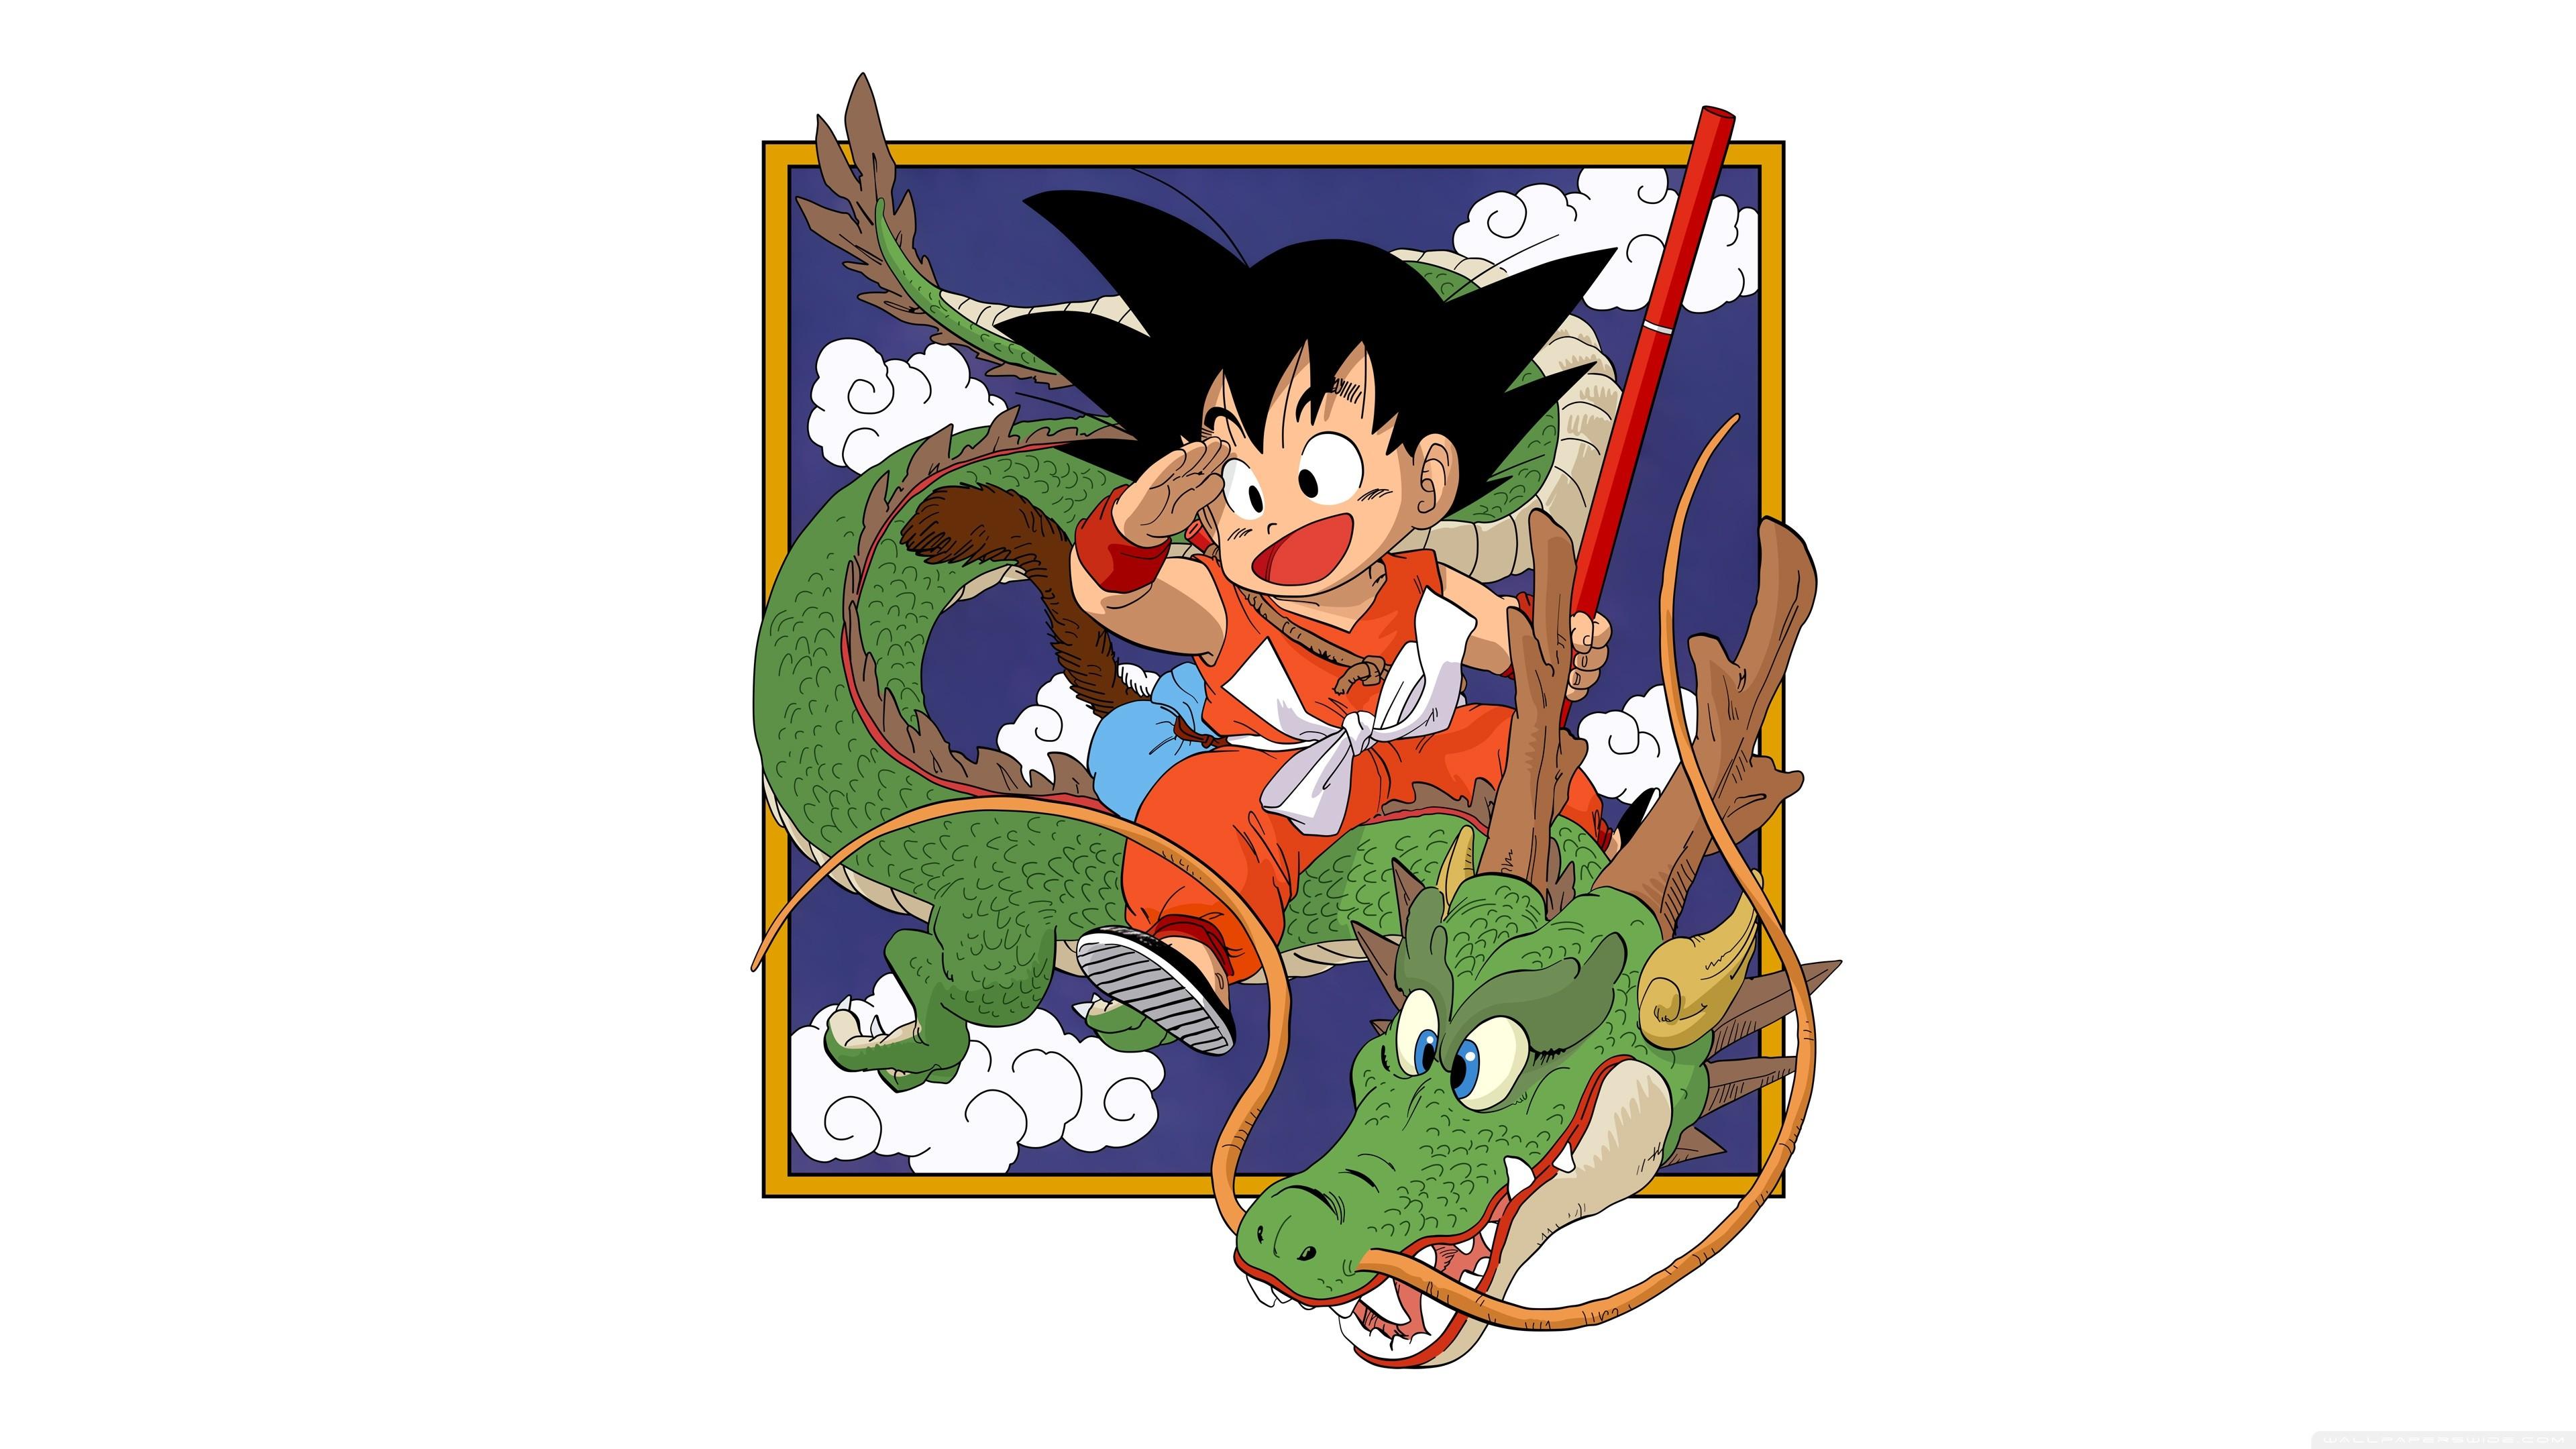 Kid Goku Wallpaper Dragon Ball 1615515 Hd Wallpaper